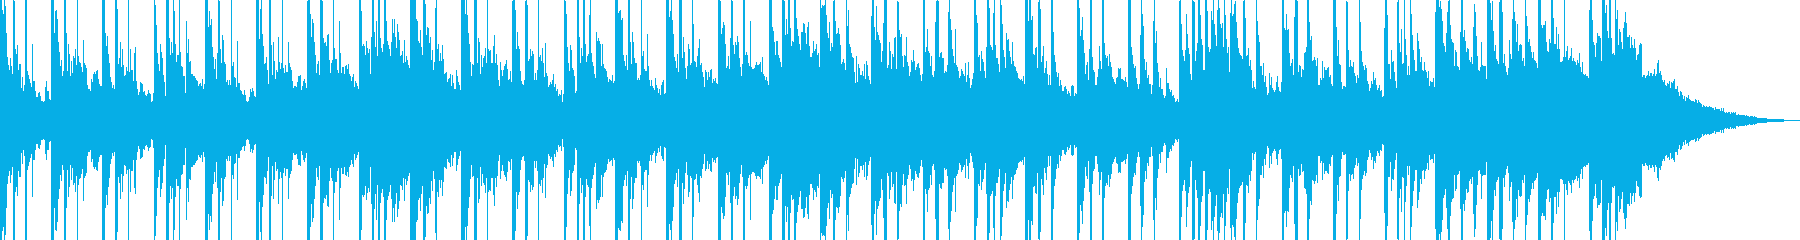 【CM】 悲しみ漂うメロディの再生済みの波形